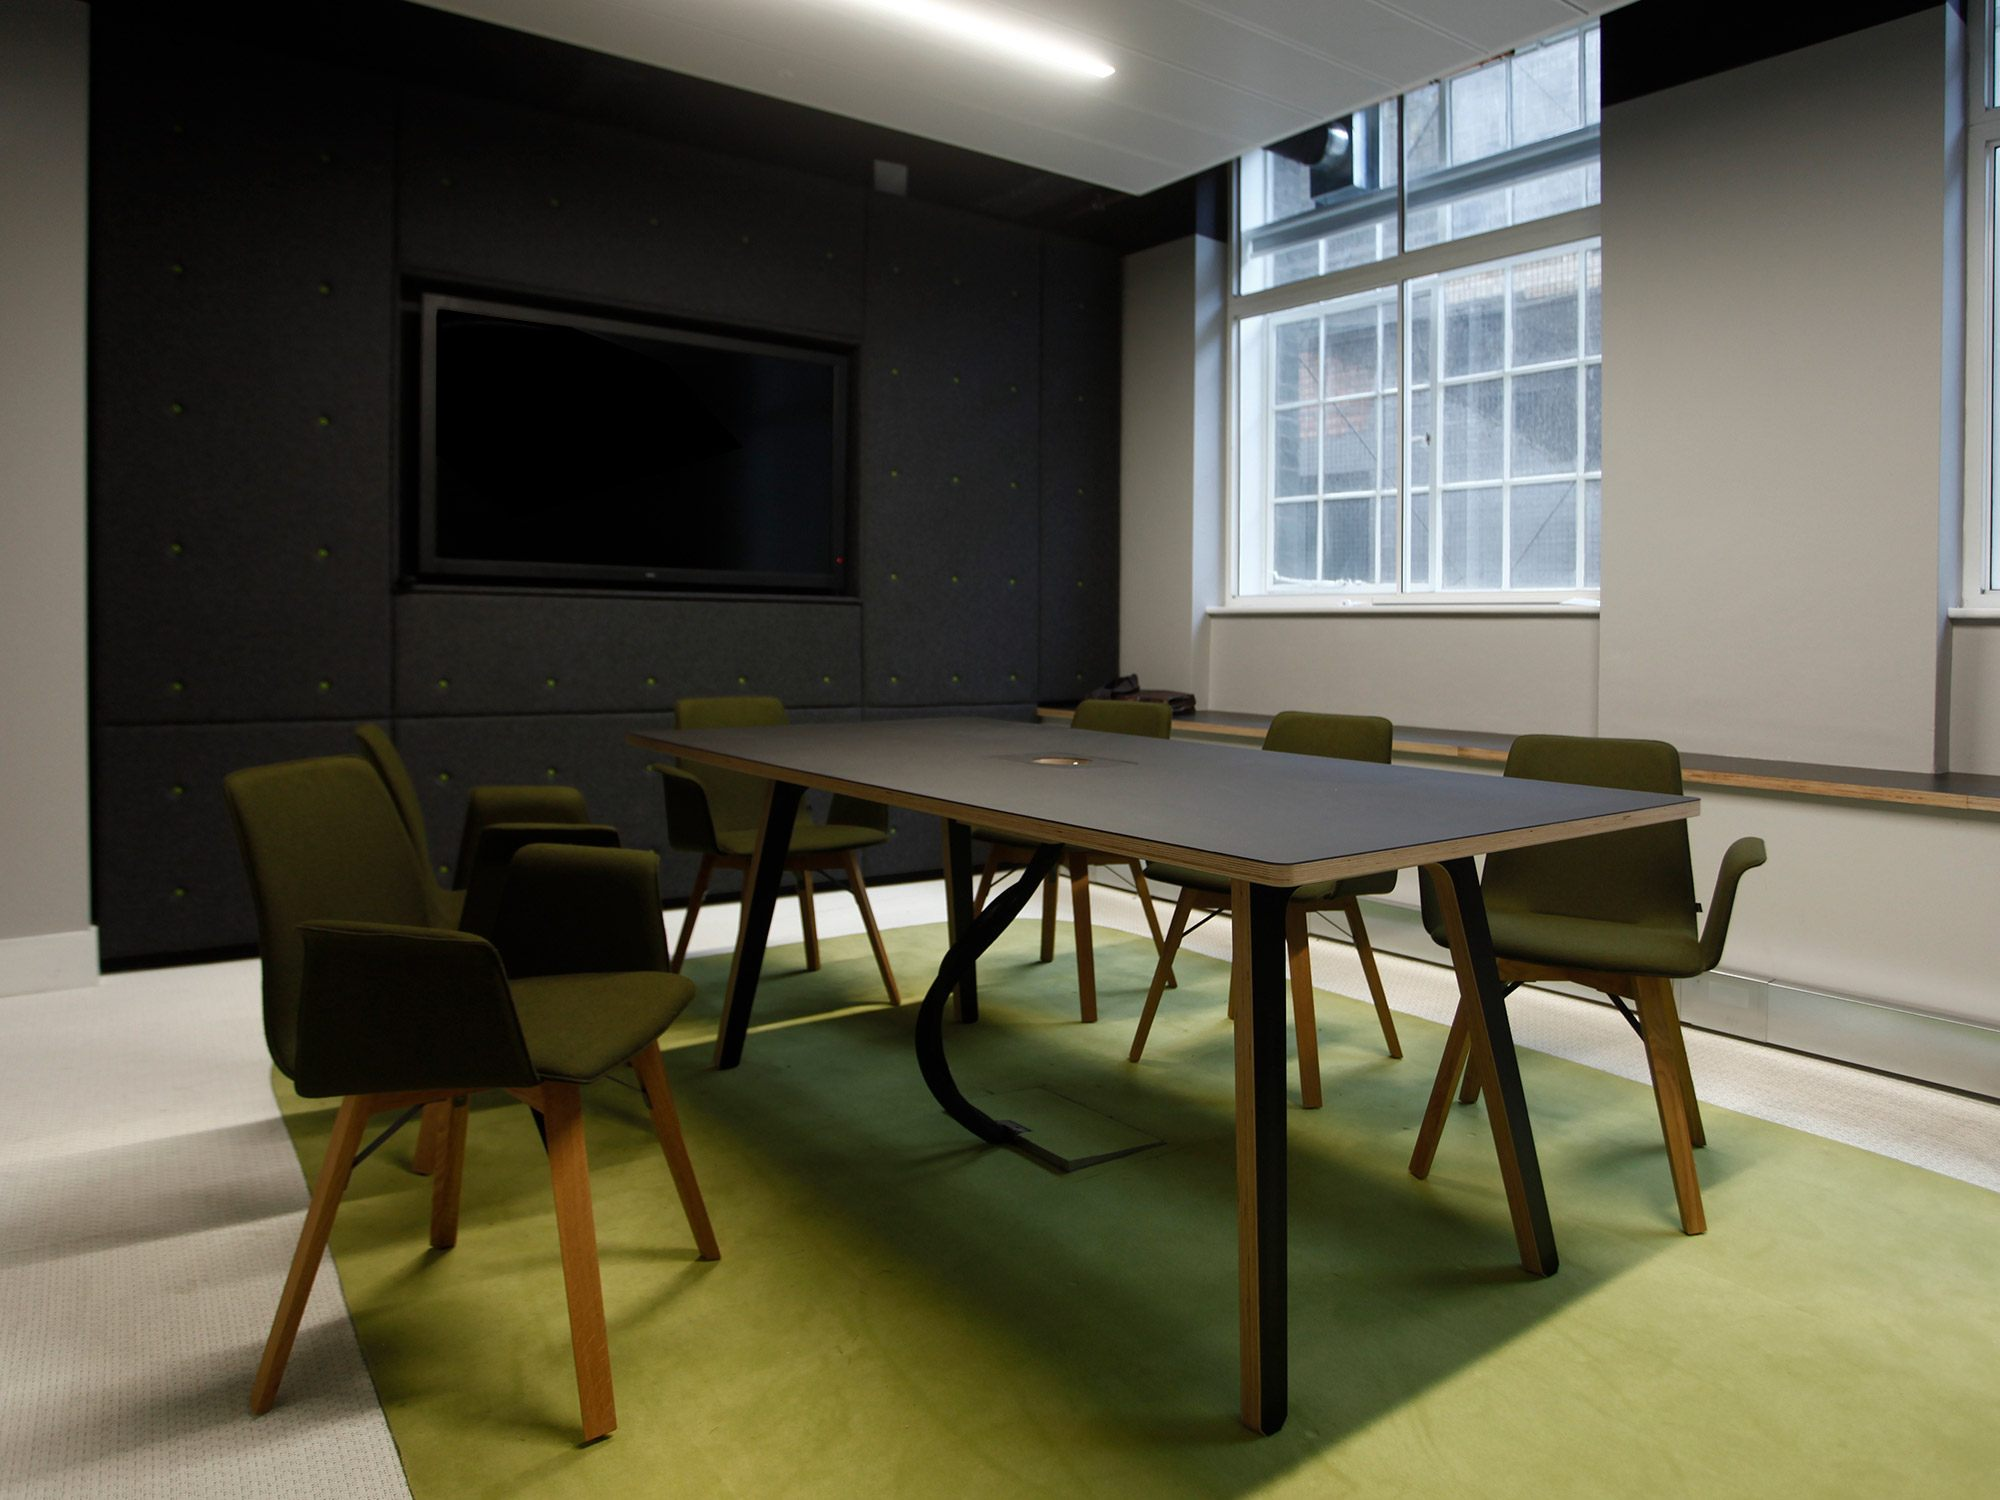 Workspace-Kingshaw-Table-ByALEX-1